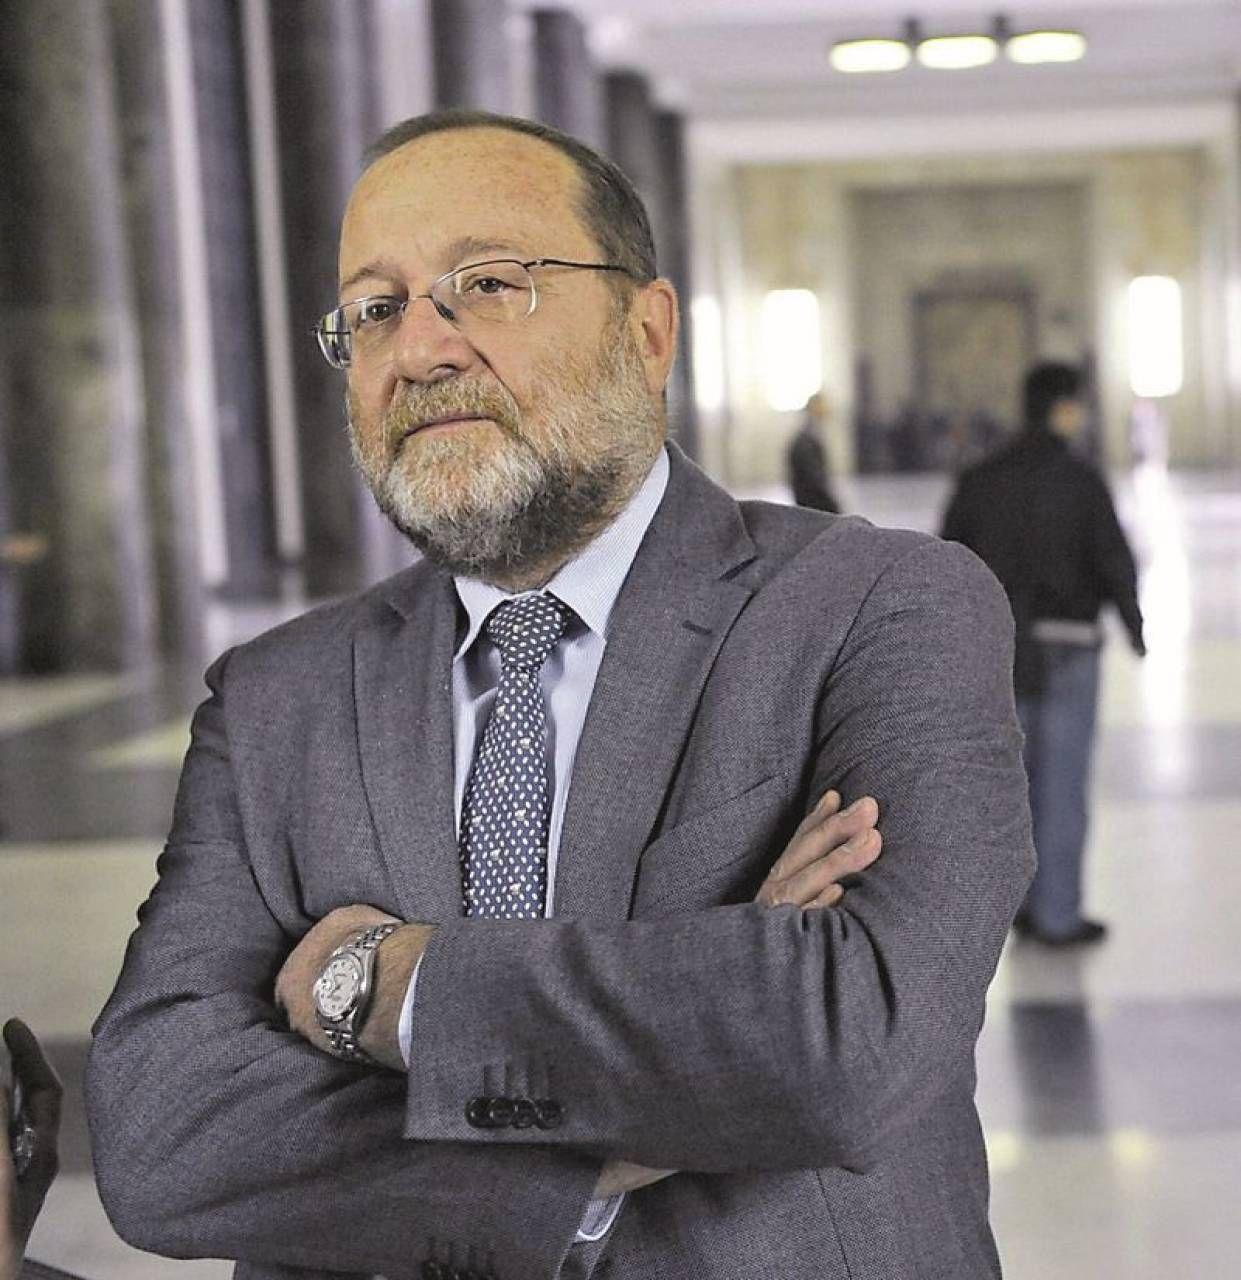 Alfredo Robledo